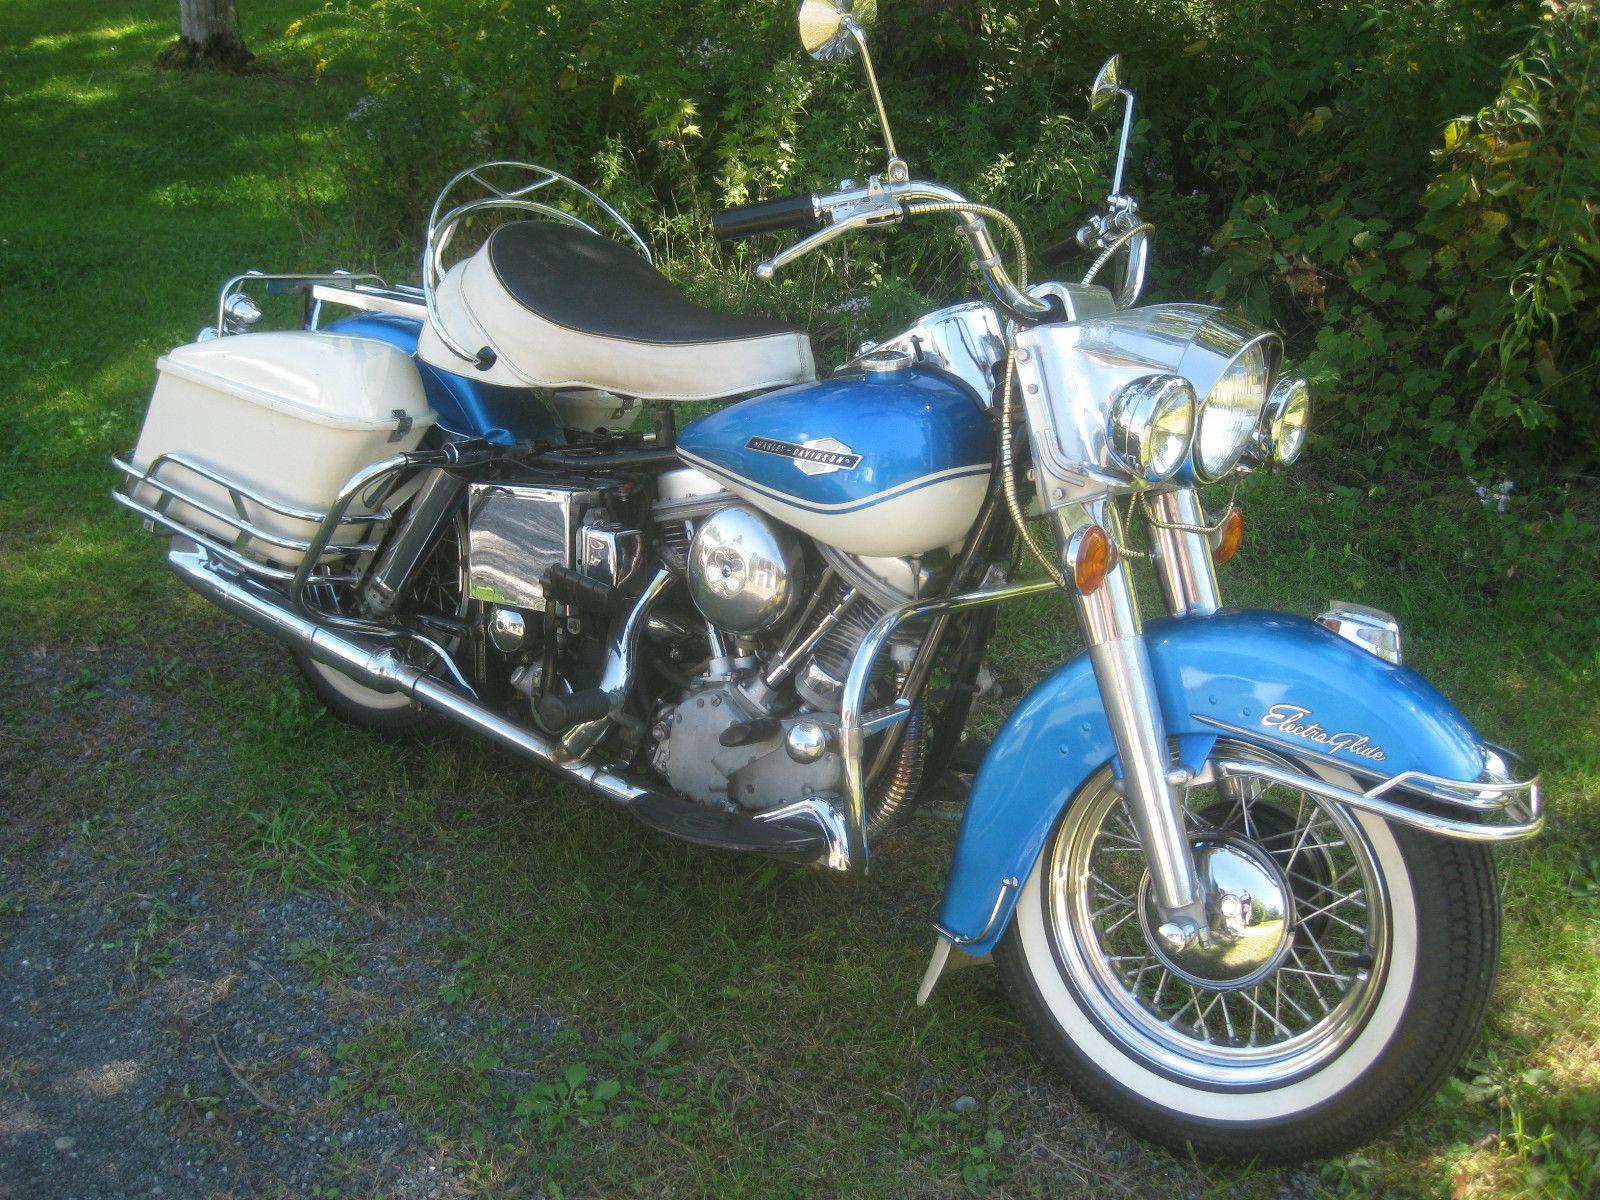 Harley Davidson Touring 1965 Harley Davidson Flh Panhead Electra Glide Original Paint Motos Harley Motos Antiguas Harley